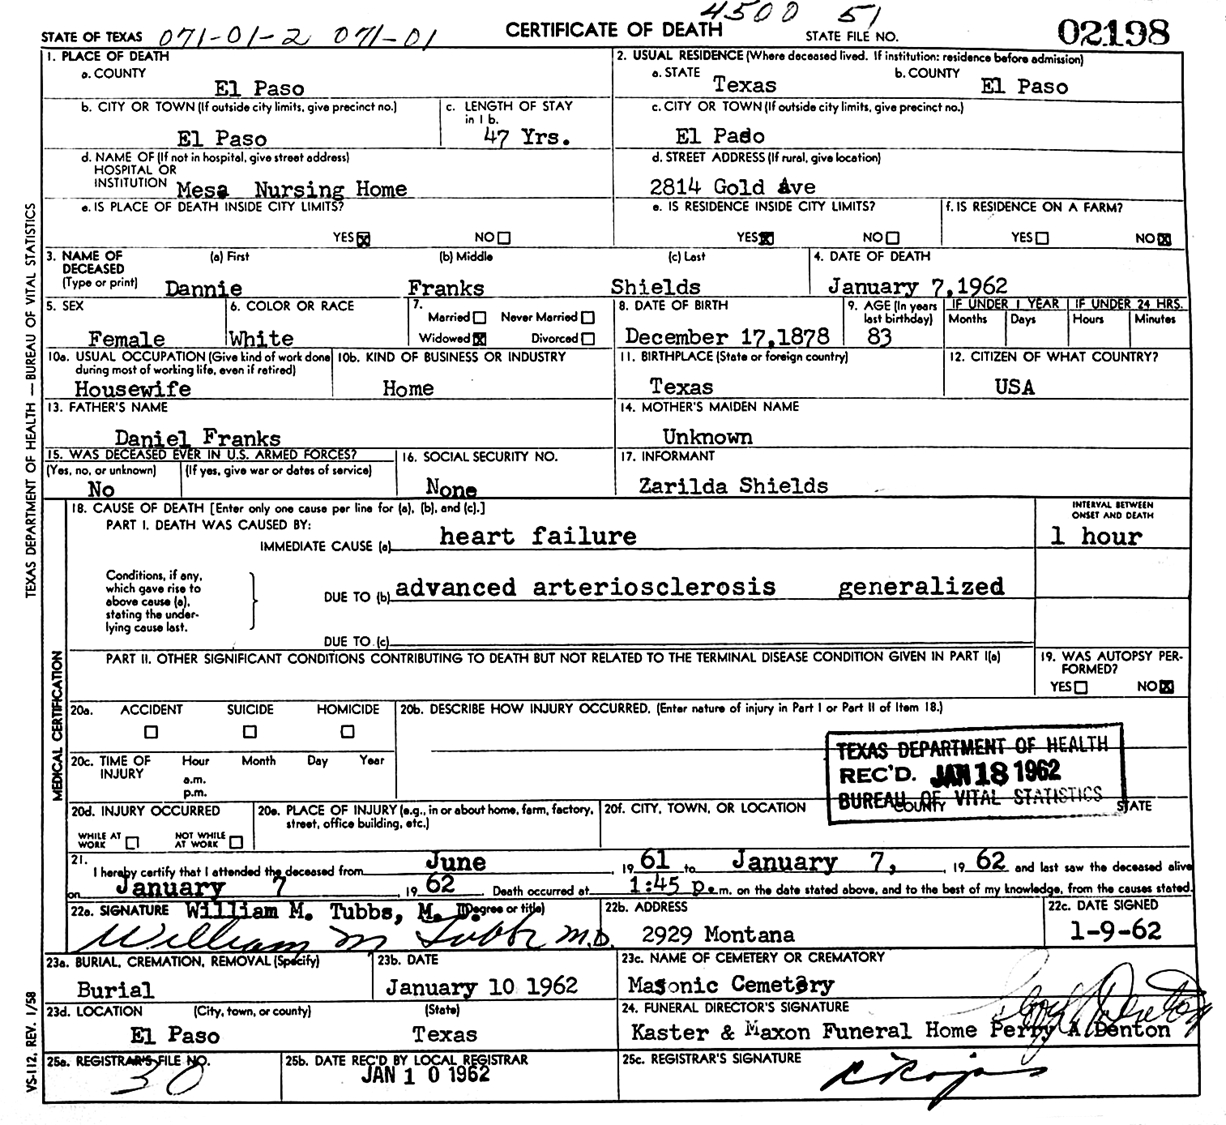 Daniel gandy franks dannie g franks shields death certificate 1betcityfo Images